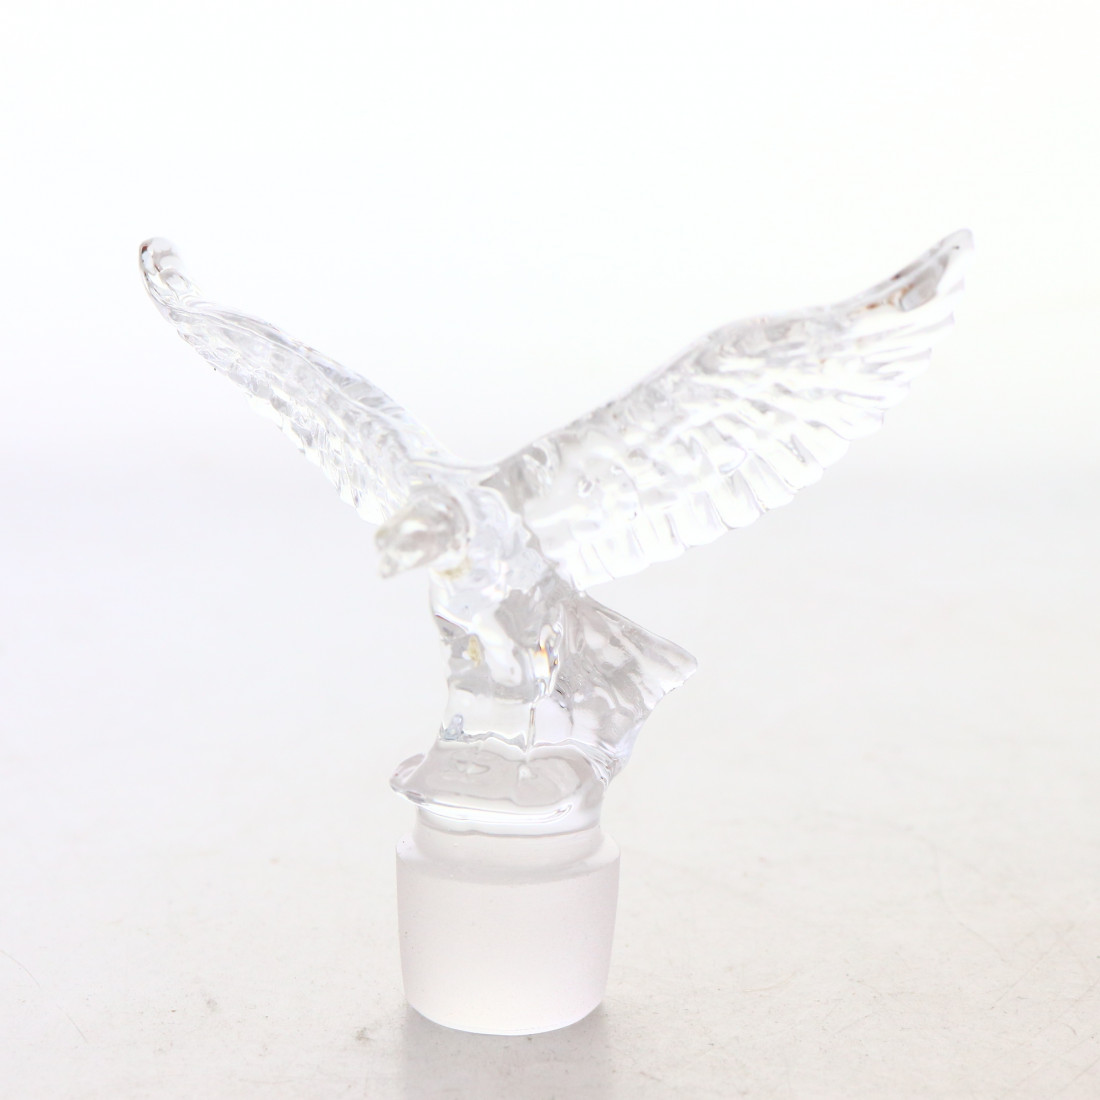 Eagle Rare 20 Year Old Double Eagle Very Rare 2019 Release